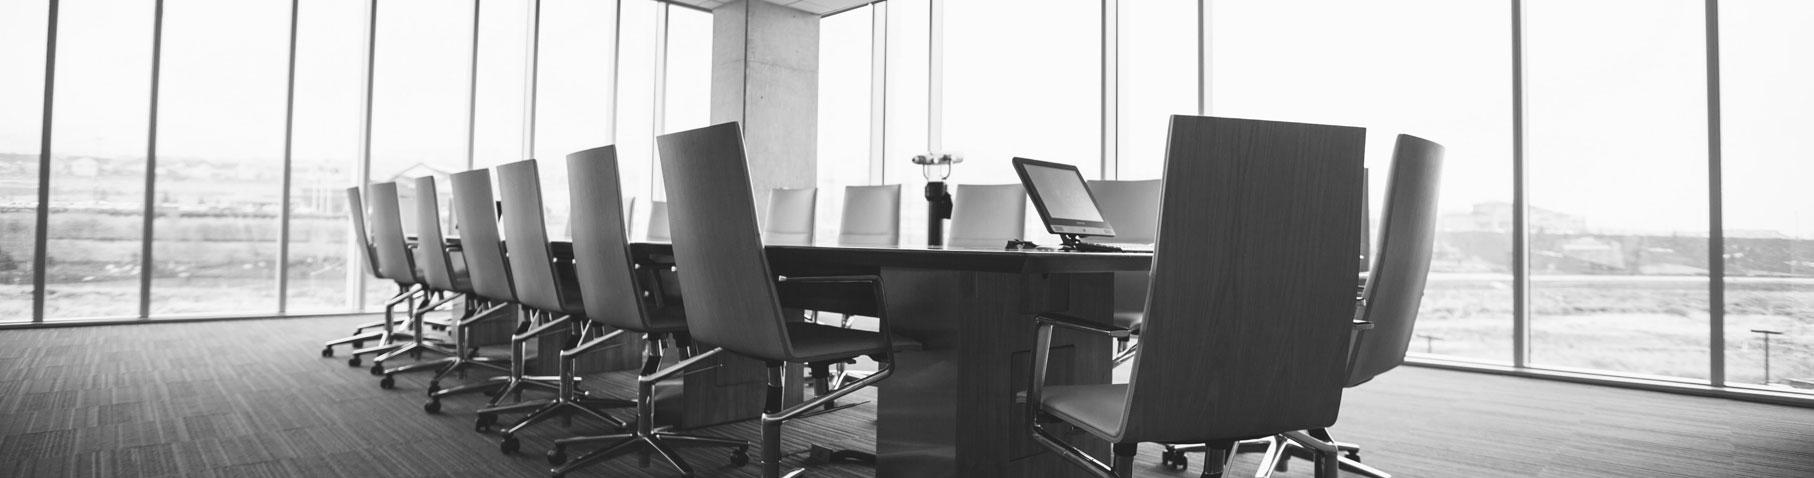 Verum Financial - Employee benefits